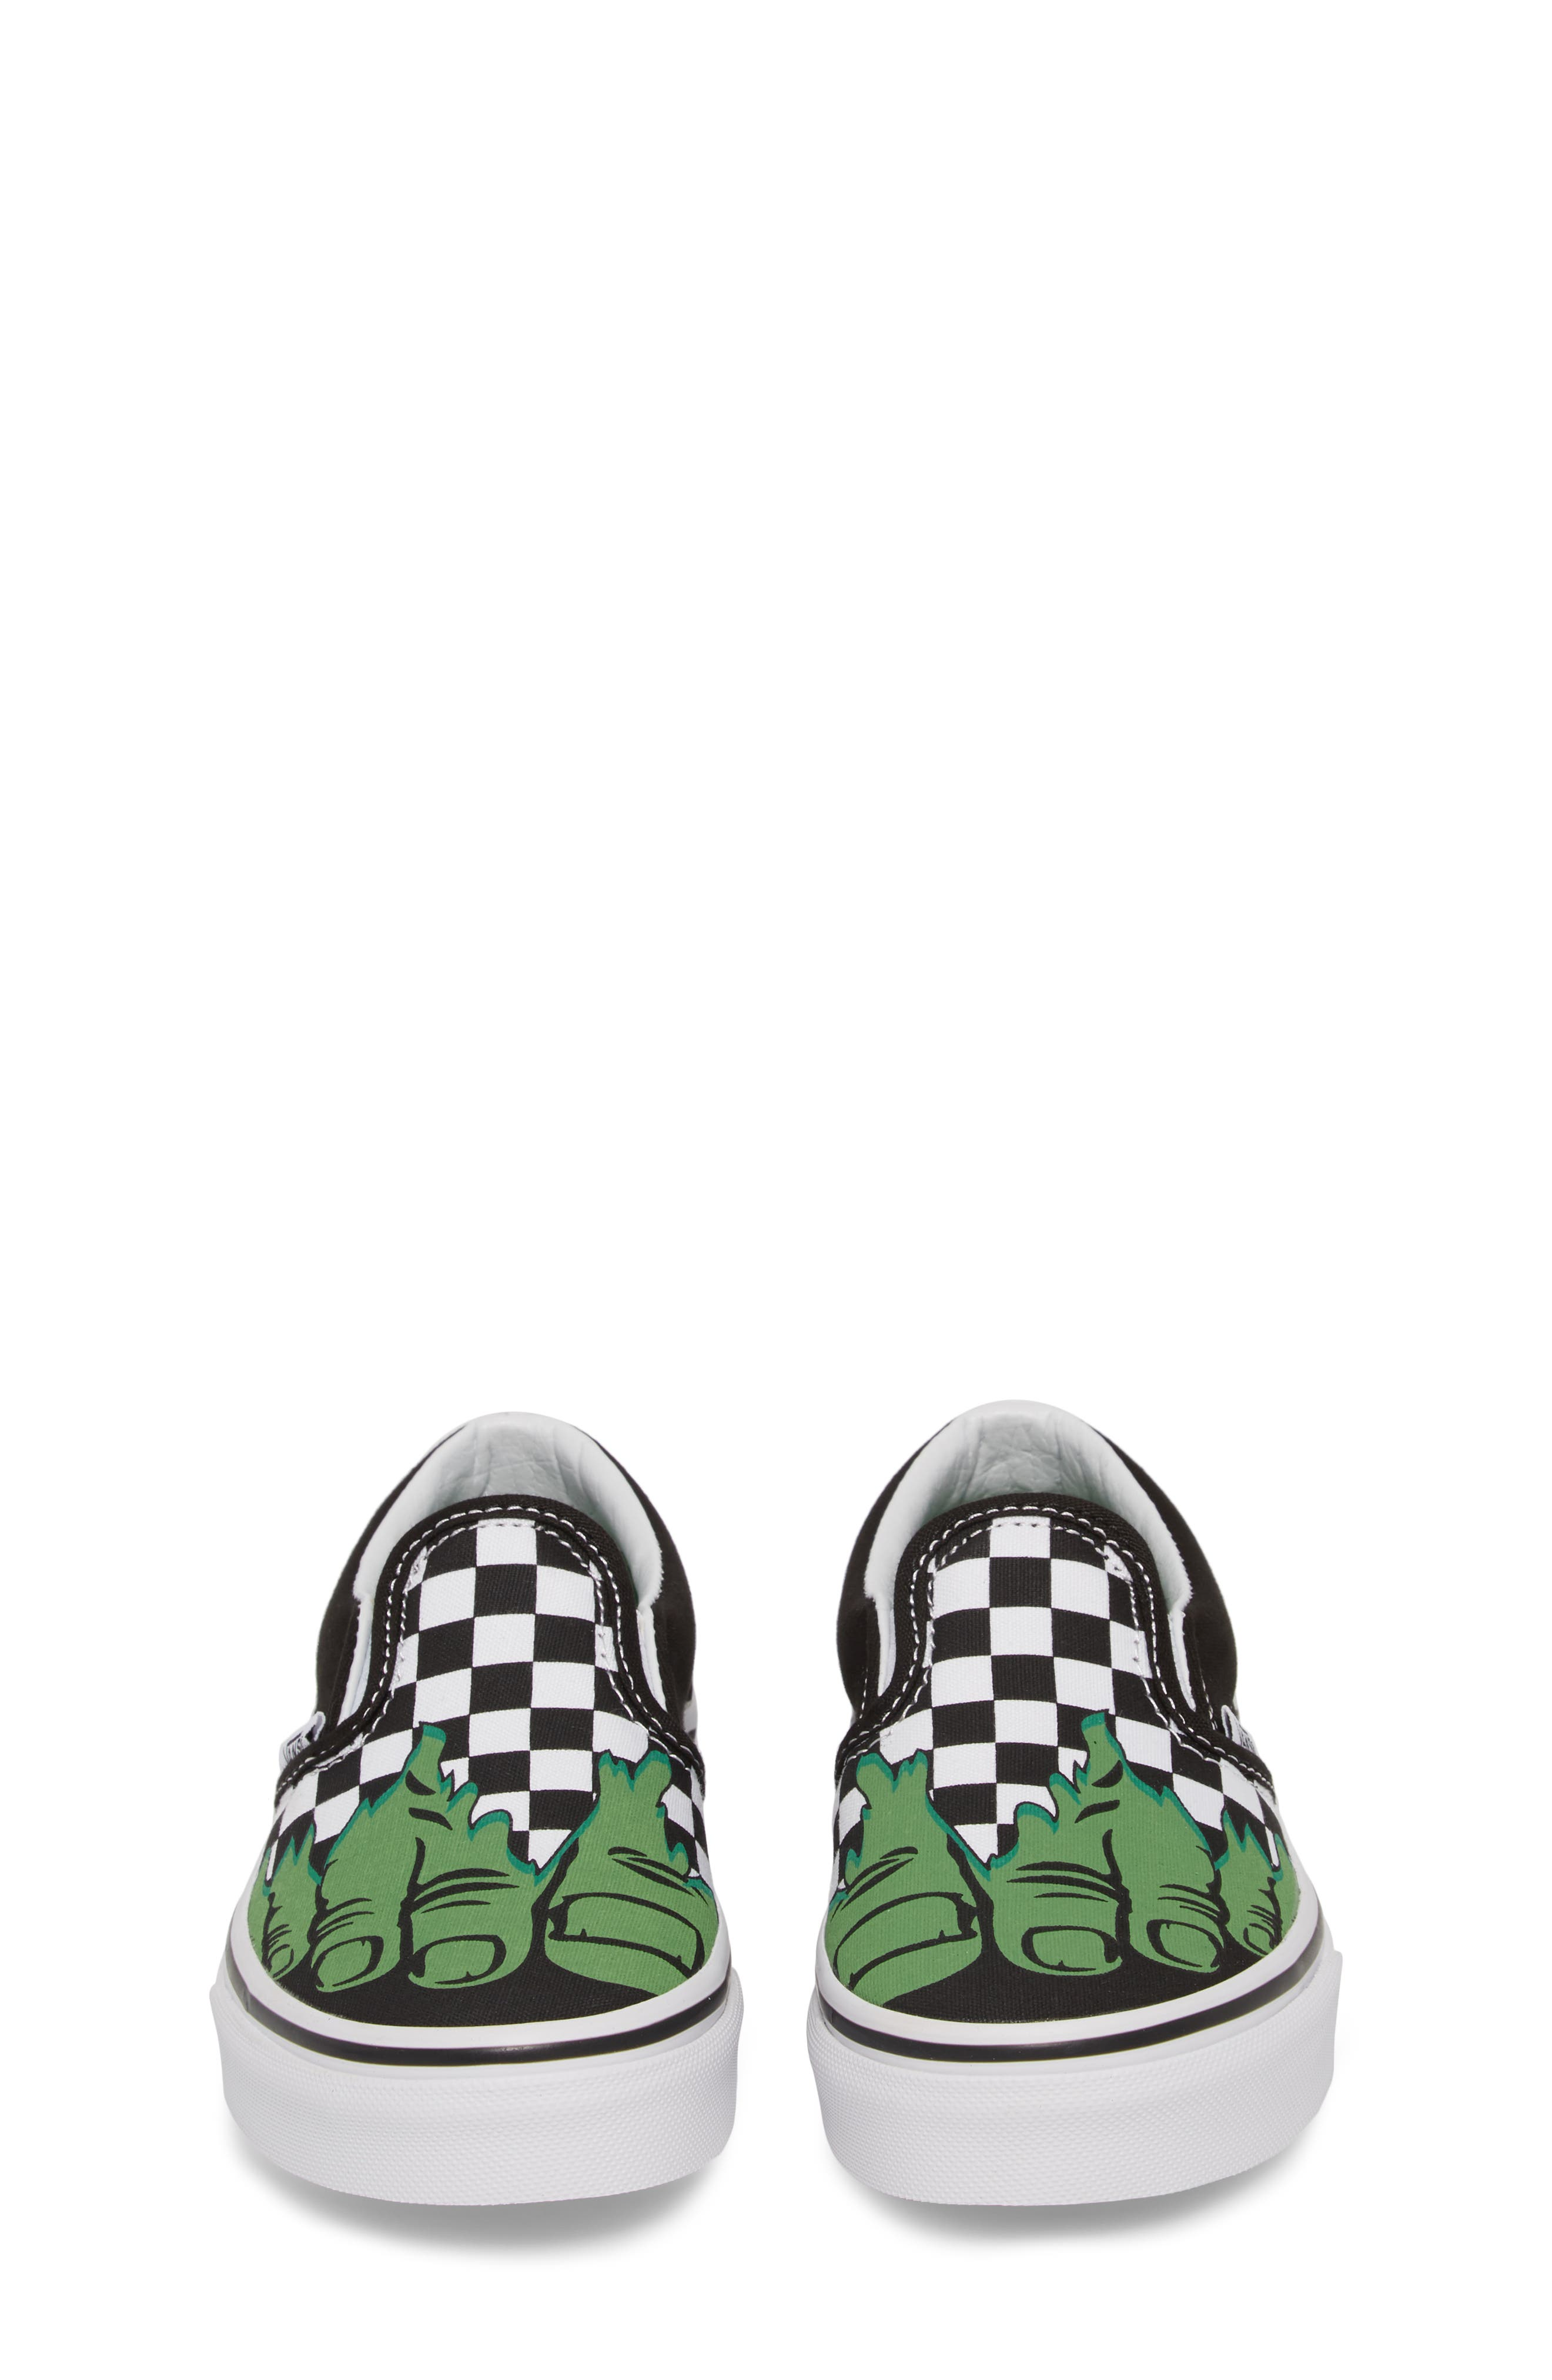 x Marvel<sup>®</sup> Hulk Checkerboard Slip-On Sneaker,                             Alternate thumbnail 5, color,                             310